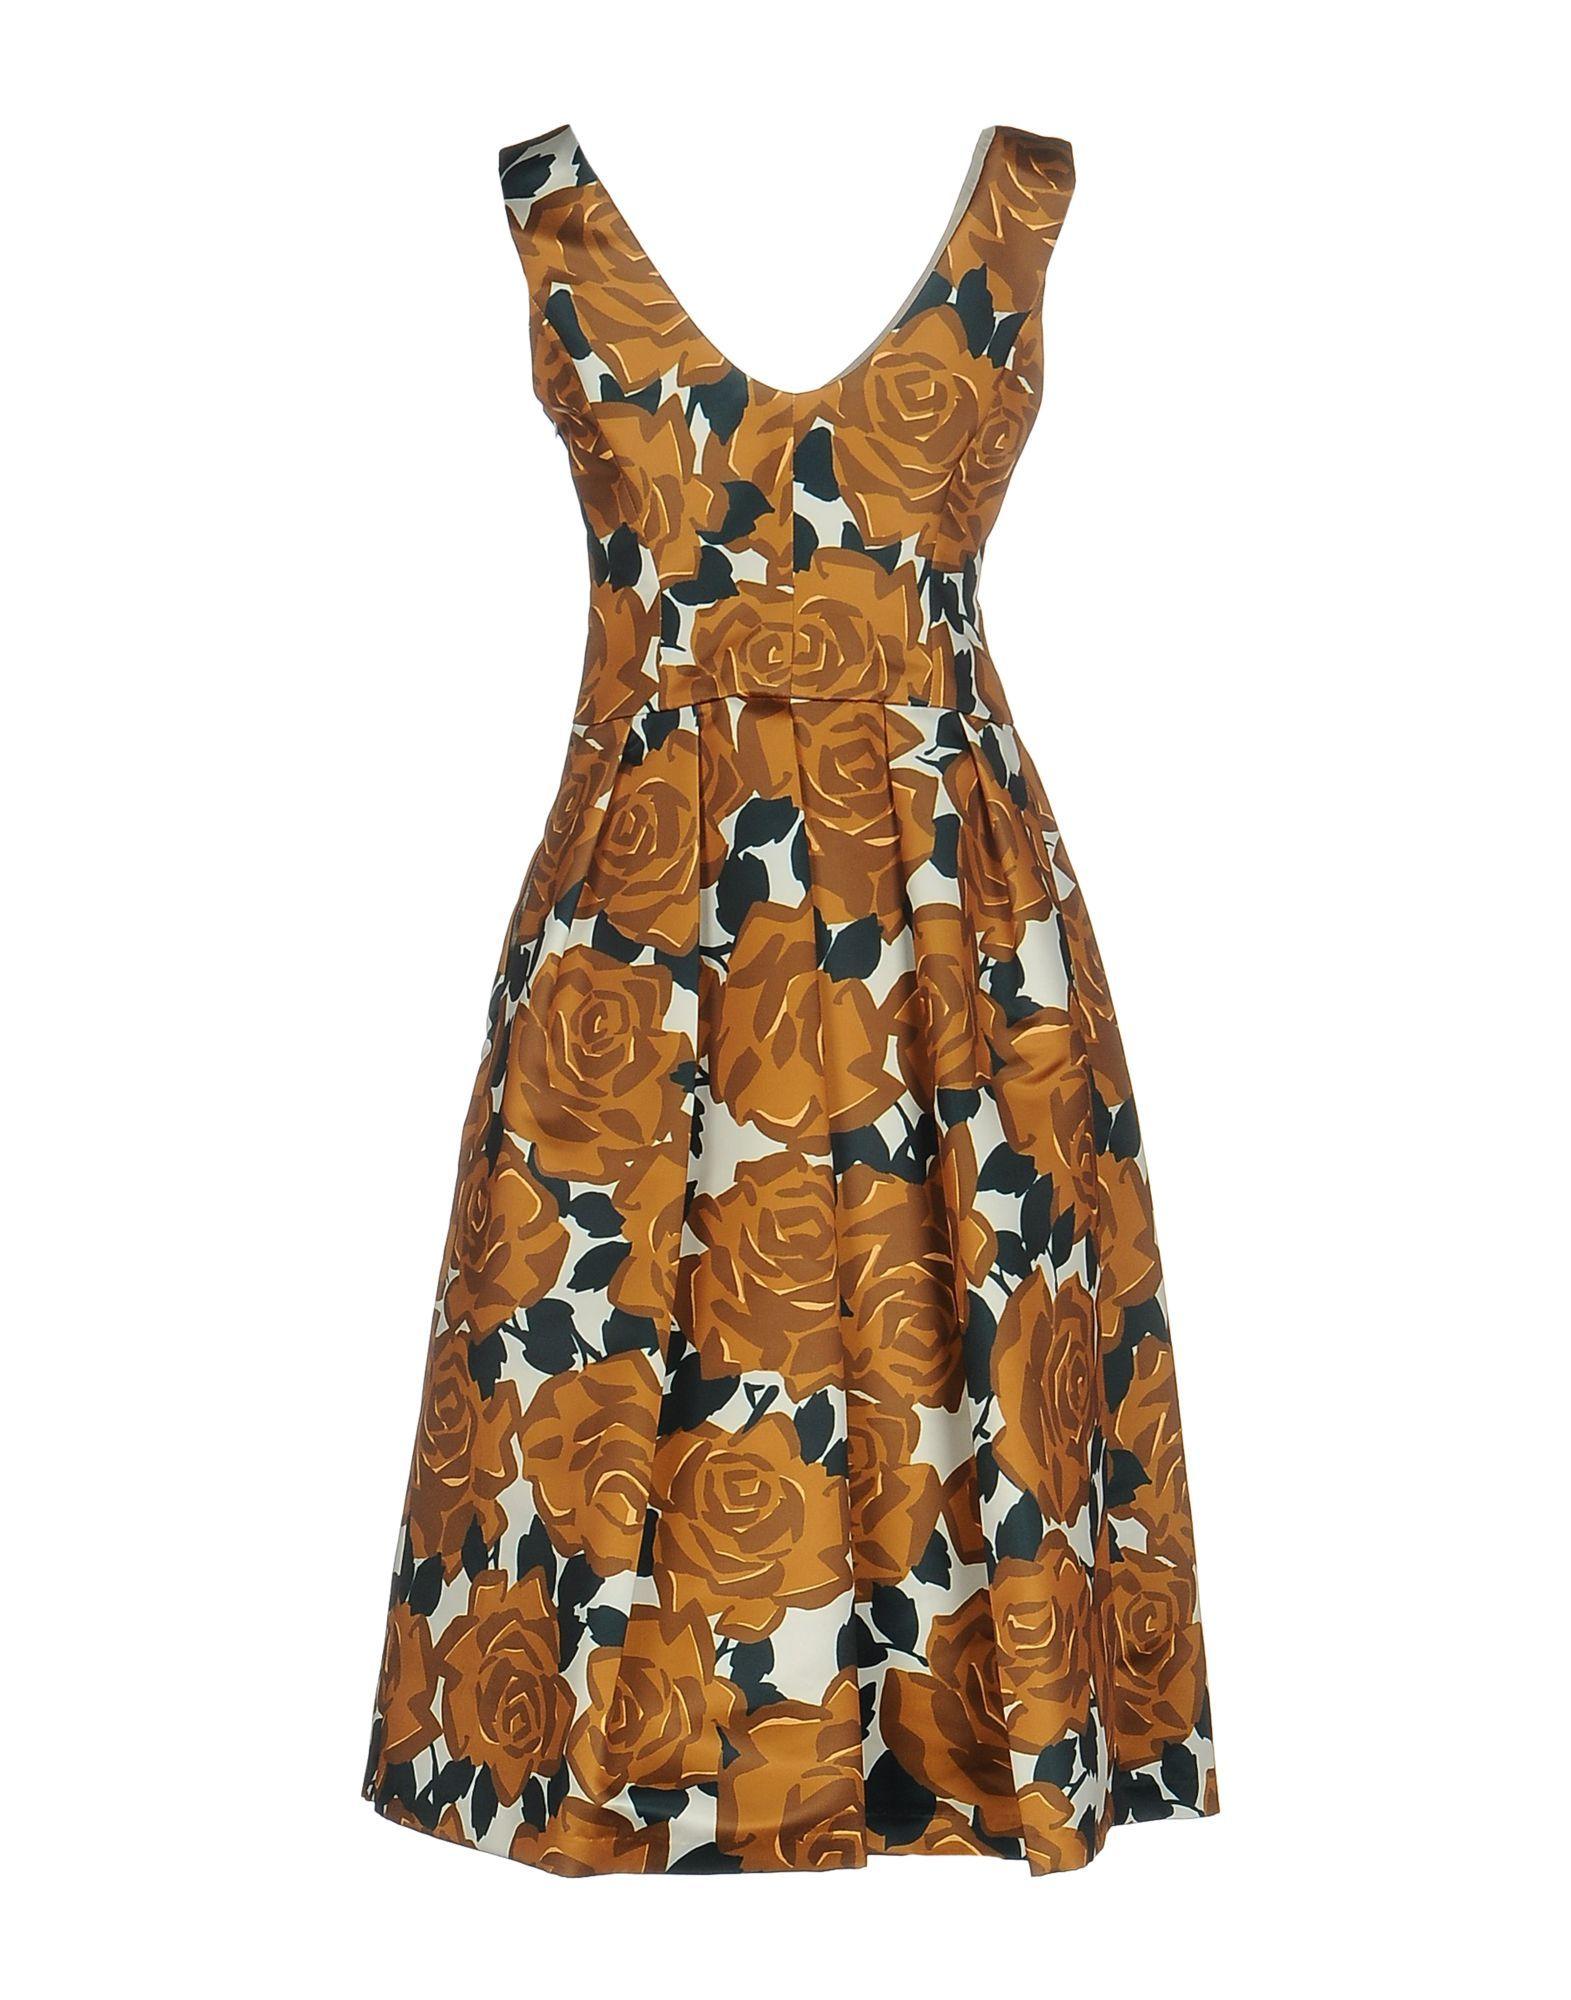 Dress Eggs Camel Women's Polyester